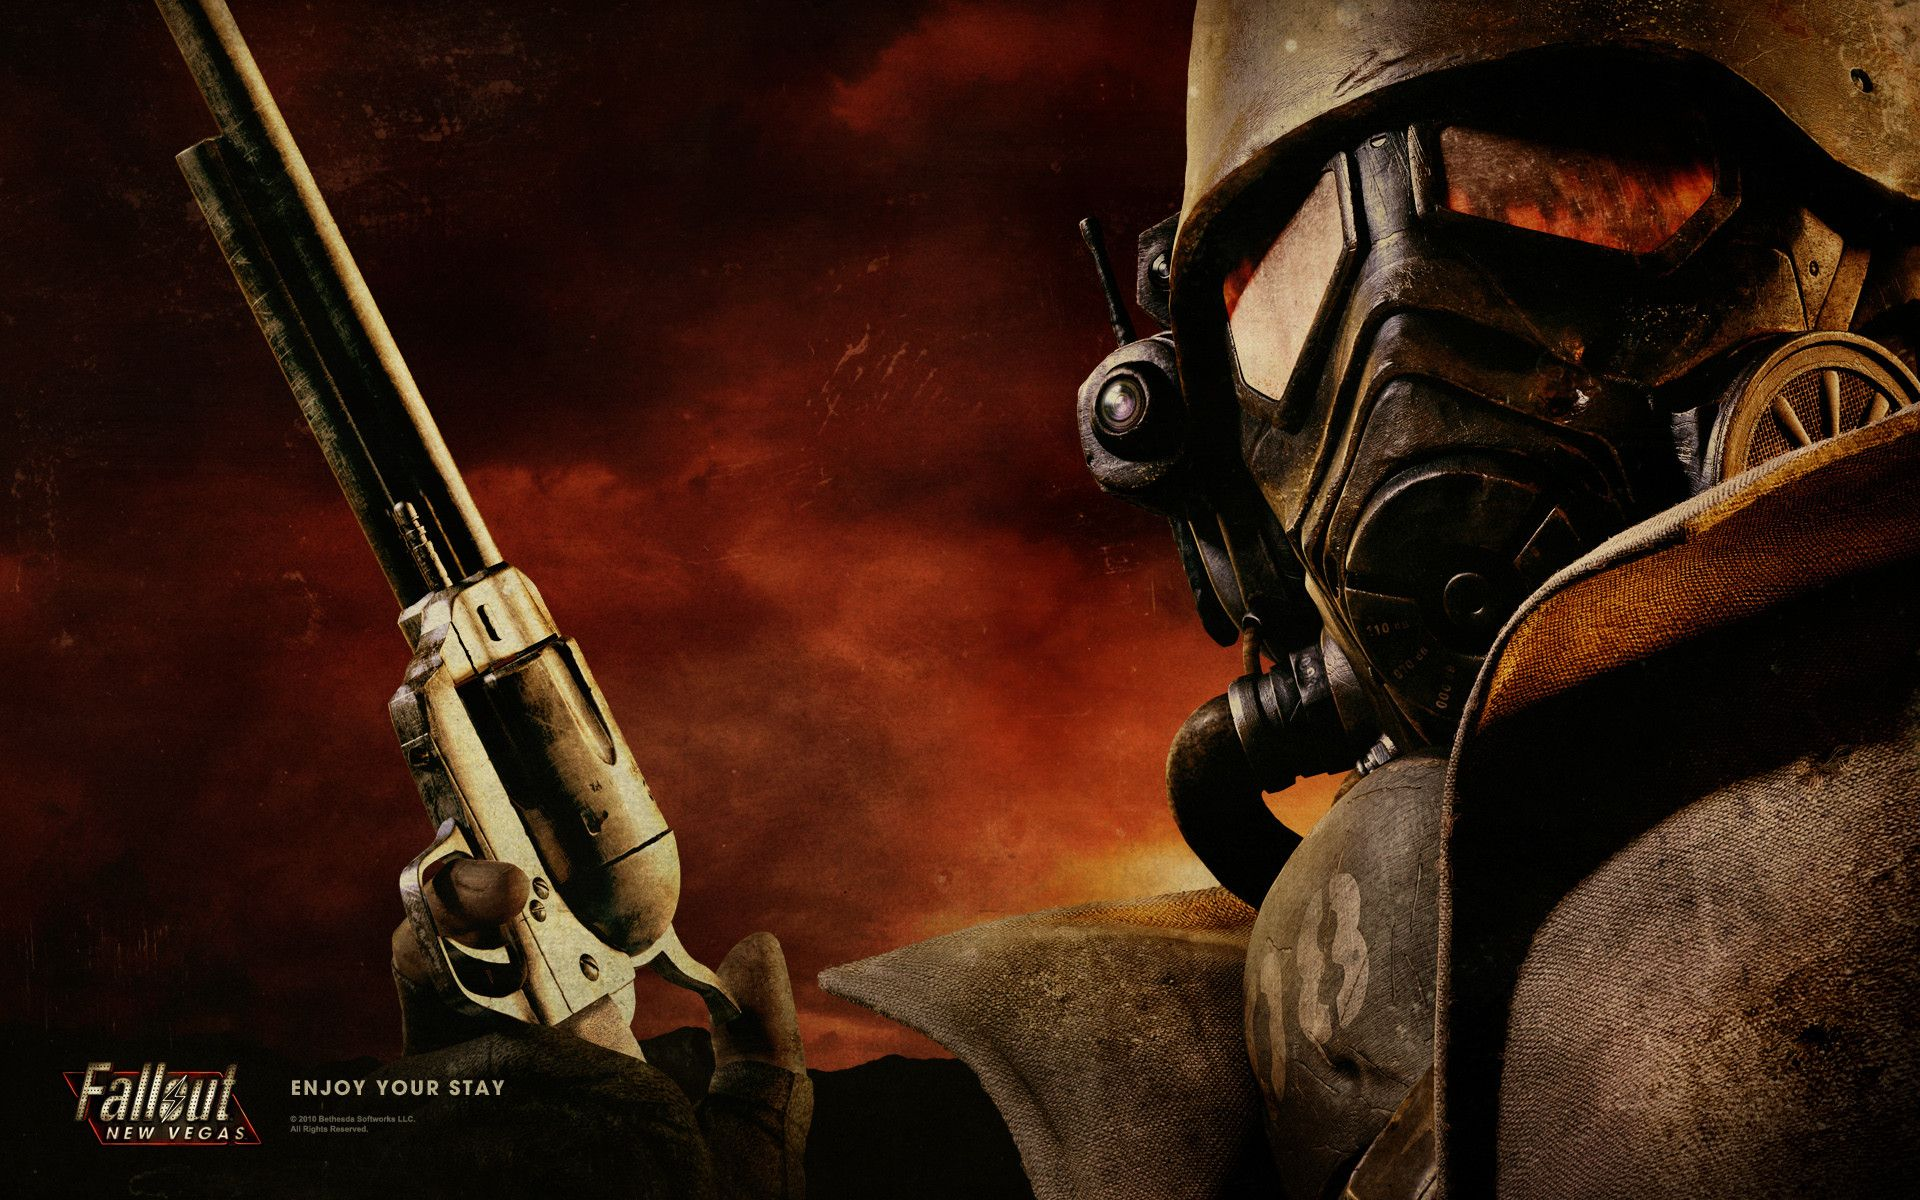 Fallout New Vegas Wallpaper 1080p - WallpaperSafari